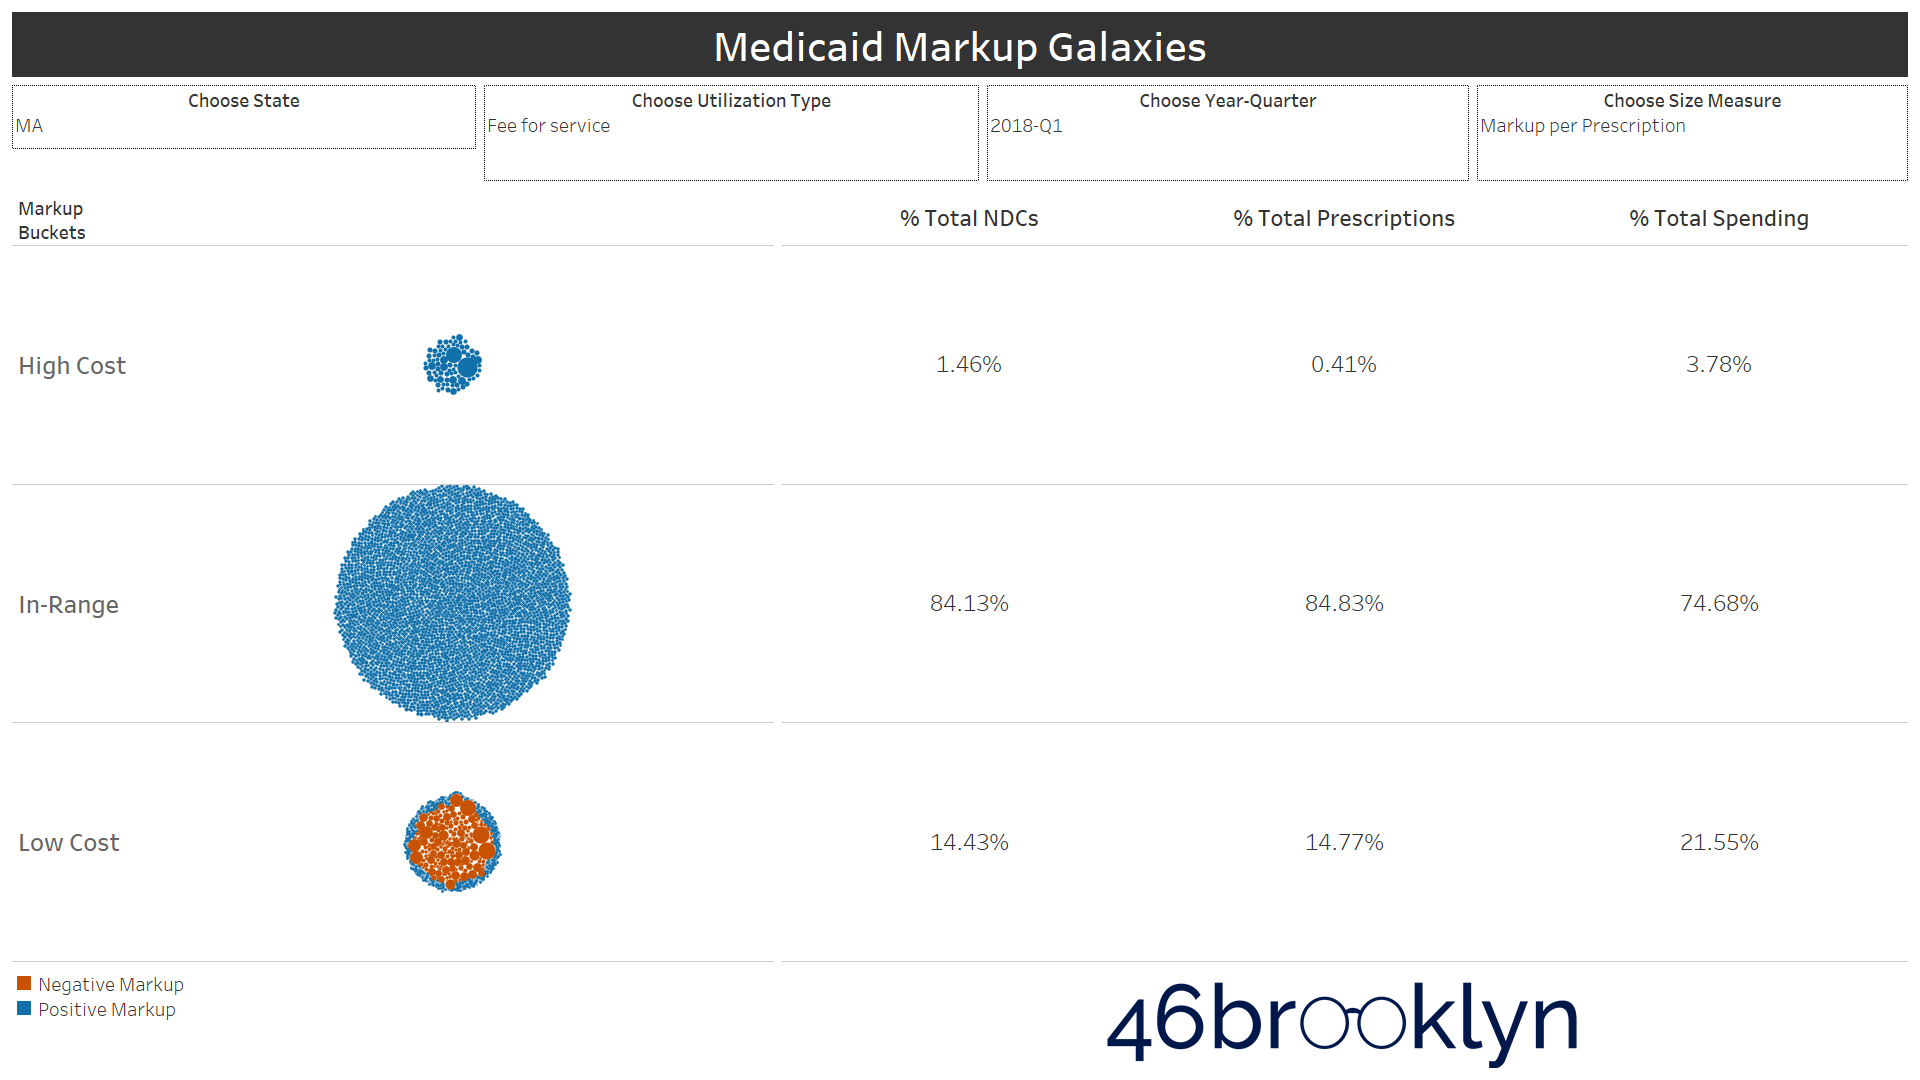 Figure 7   Source: Data.Medicaid.gov, 46brooklyn Research